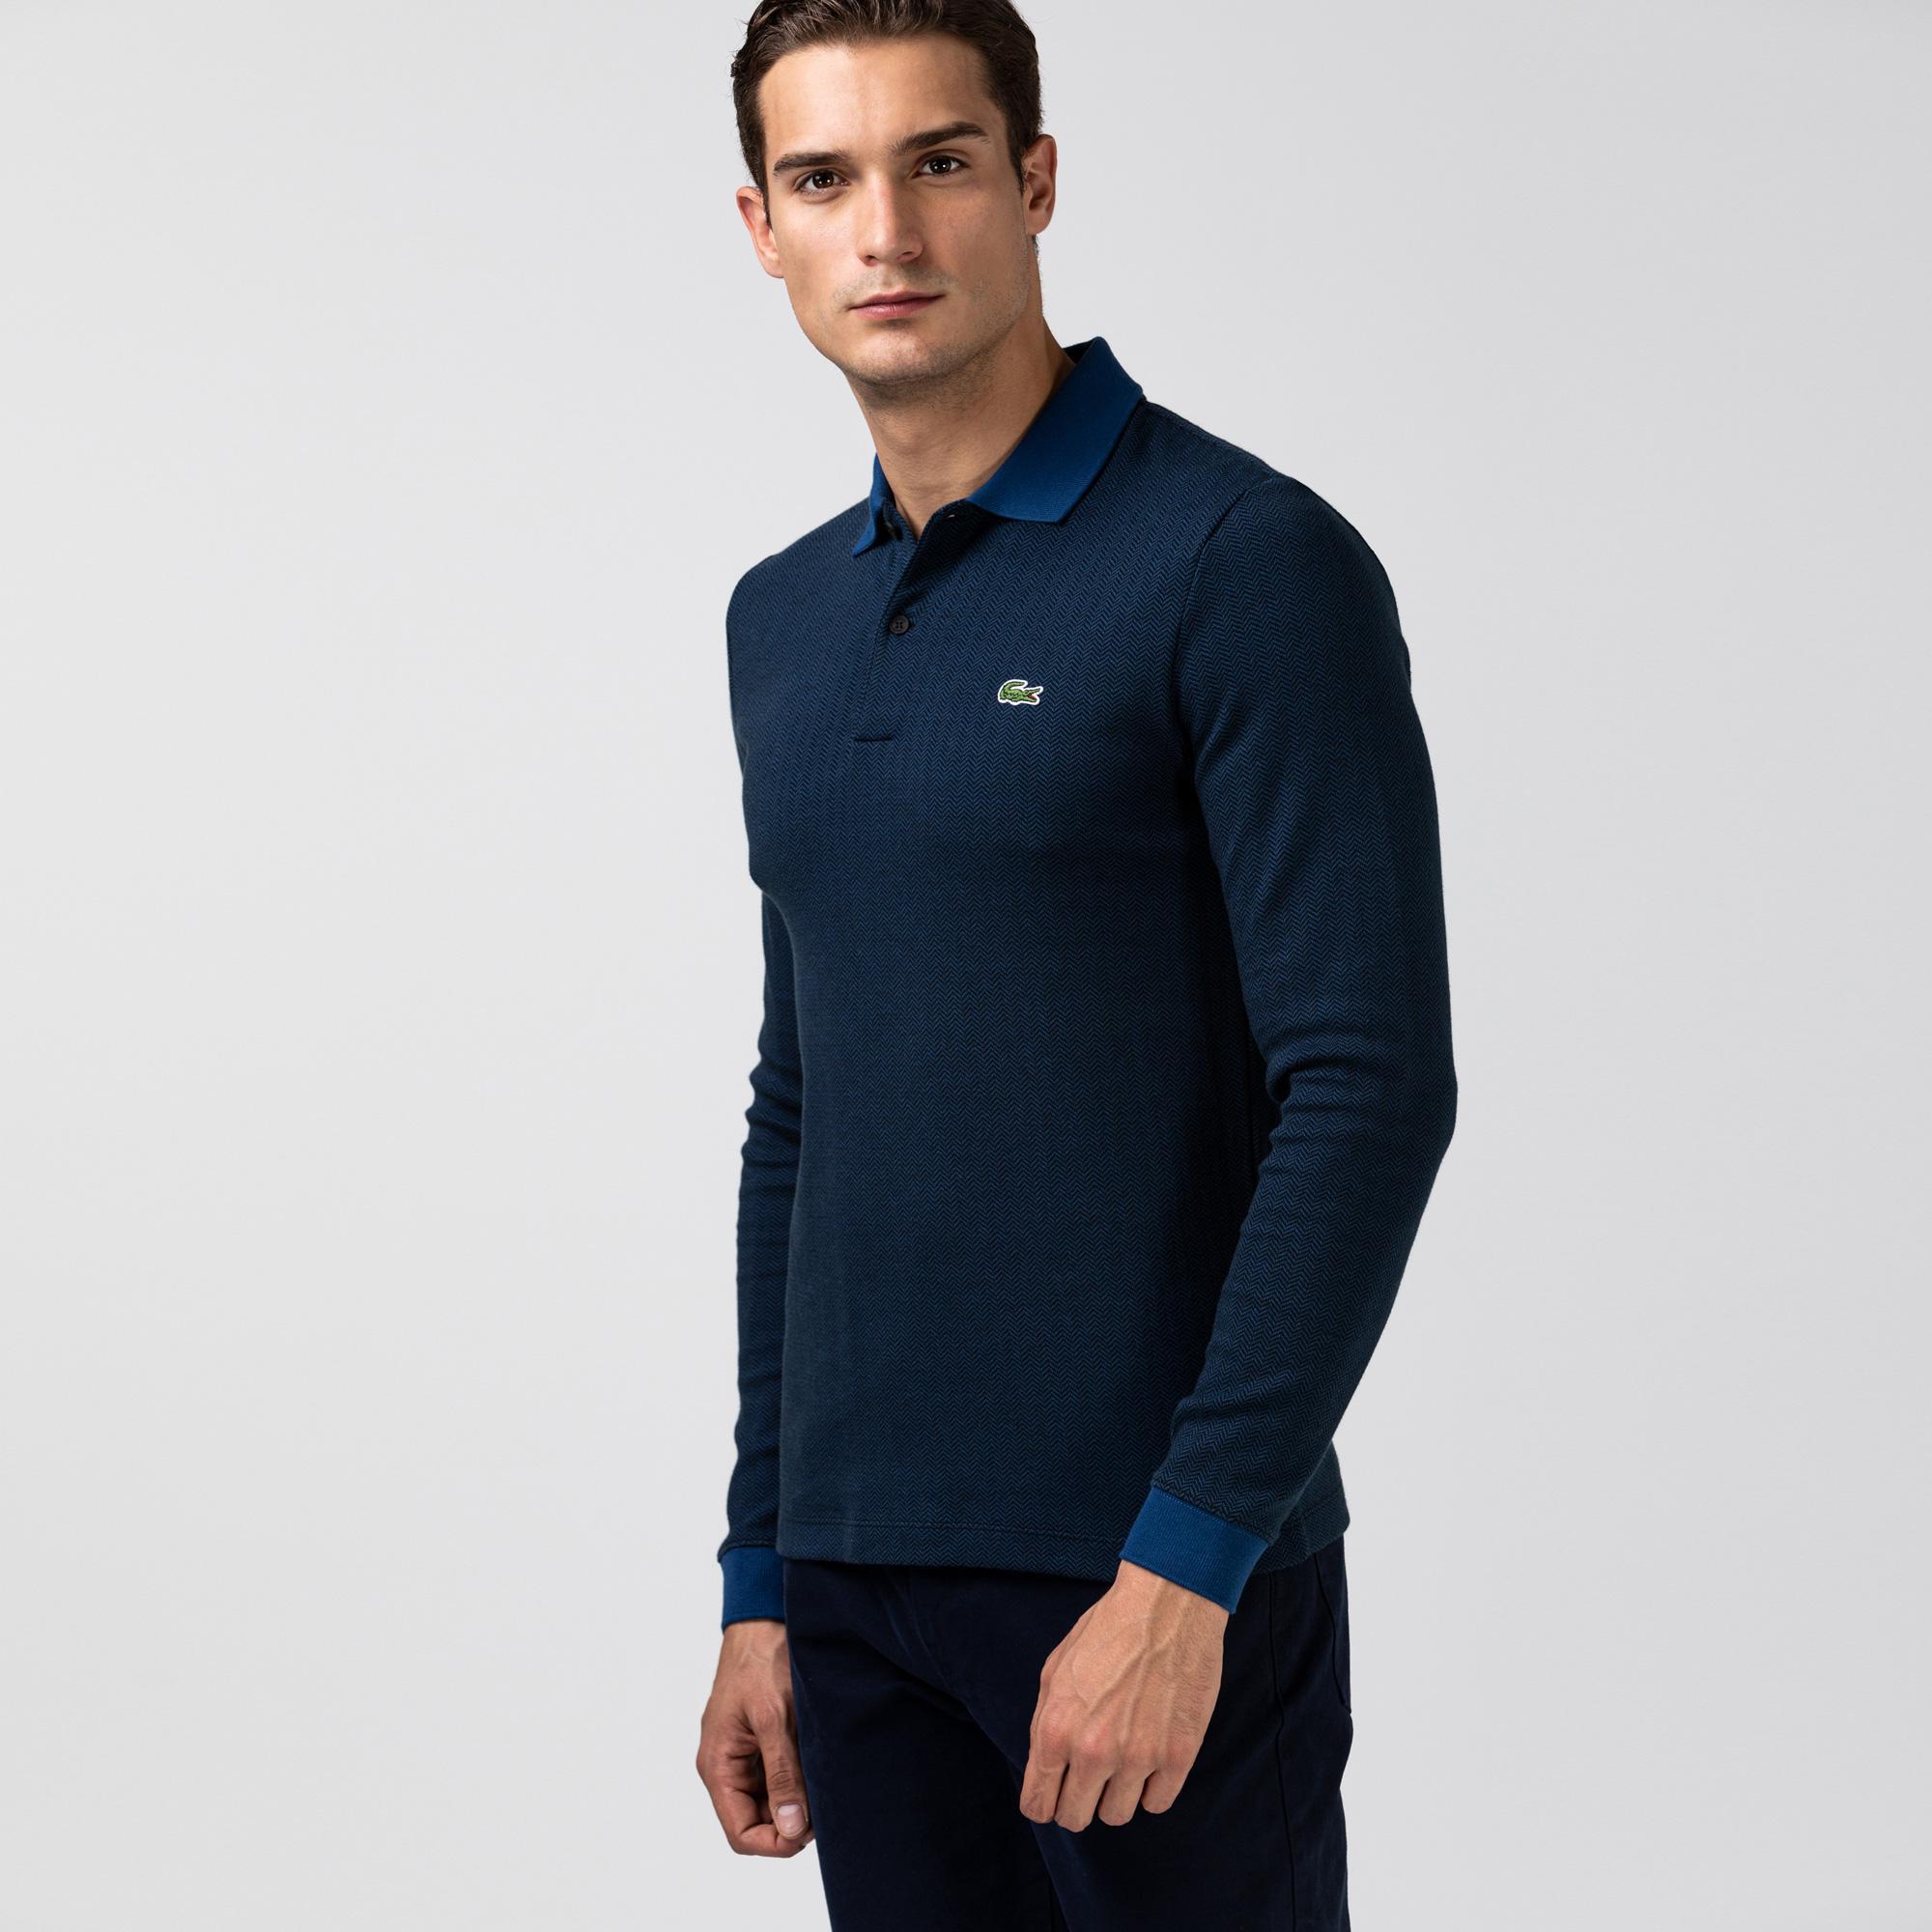 Lacoste Men's Regular Fit Herringbone Cotton Polo